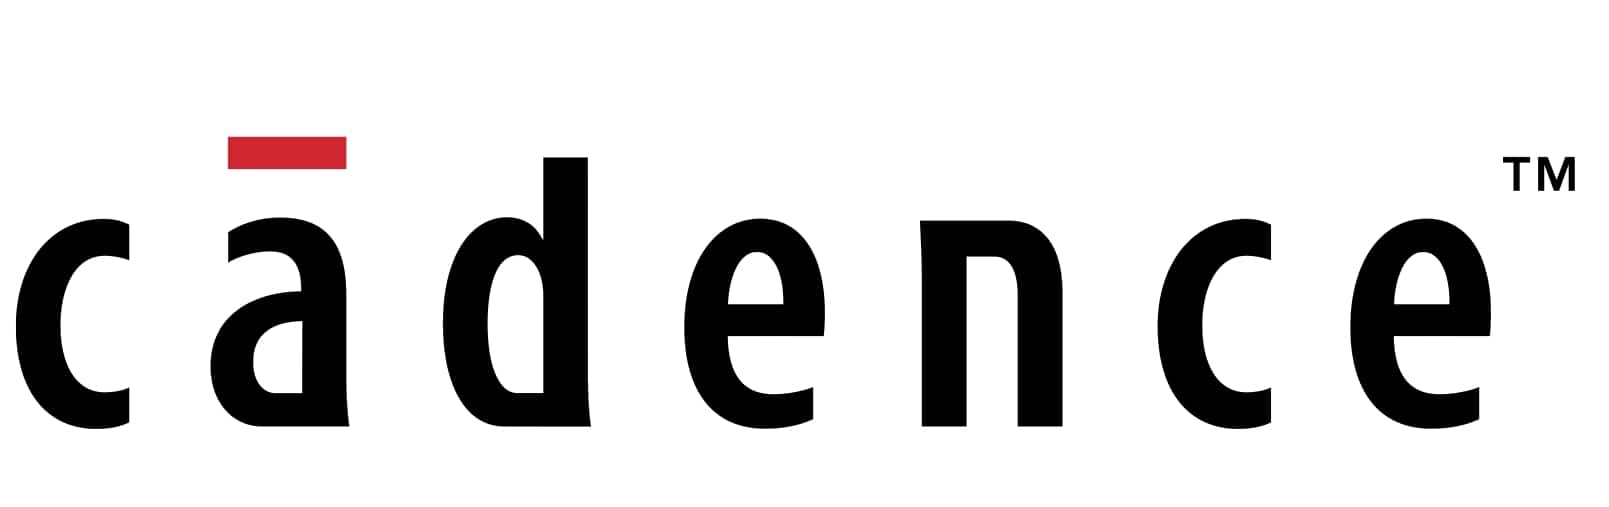 Cadence Orcad Allegro Sigrity相关软件资源下载分享 持续更新 敬请关注